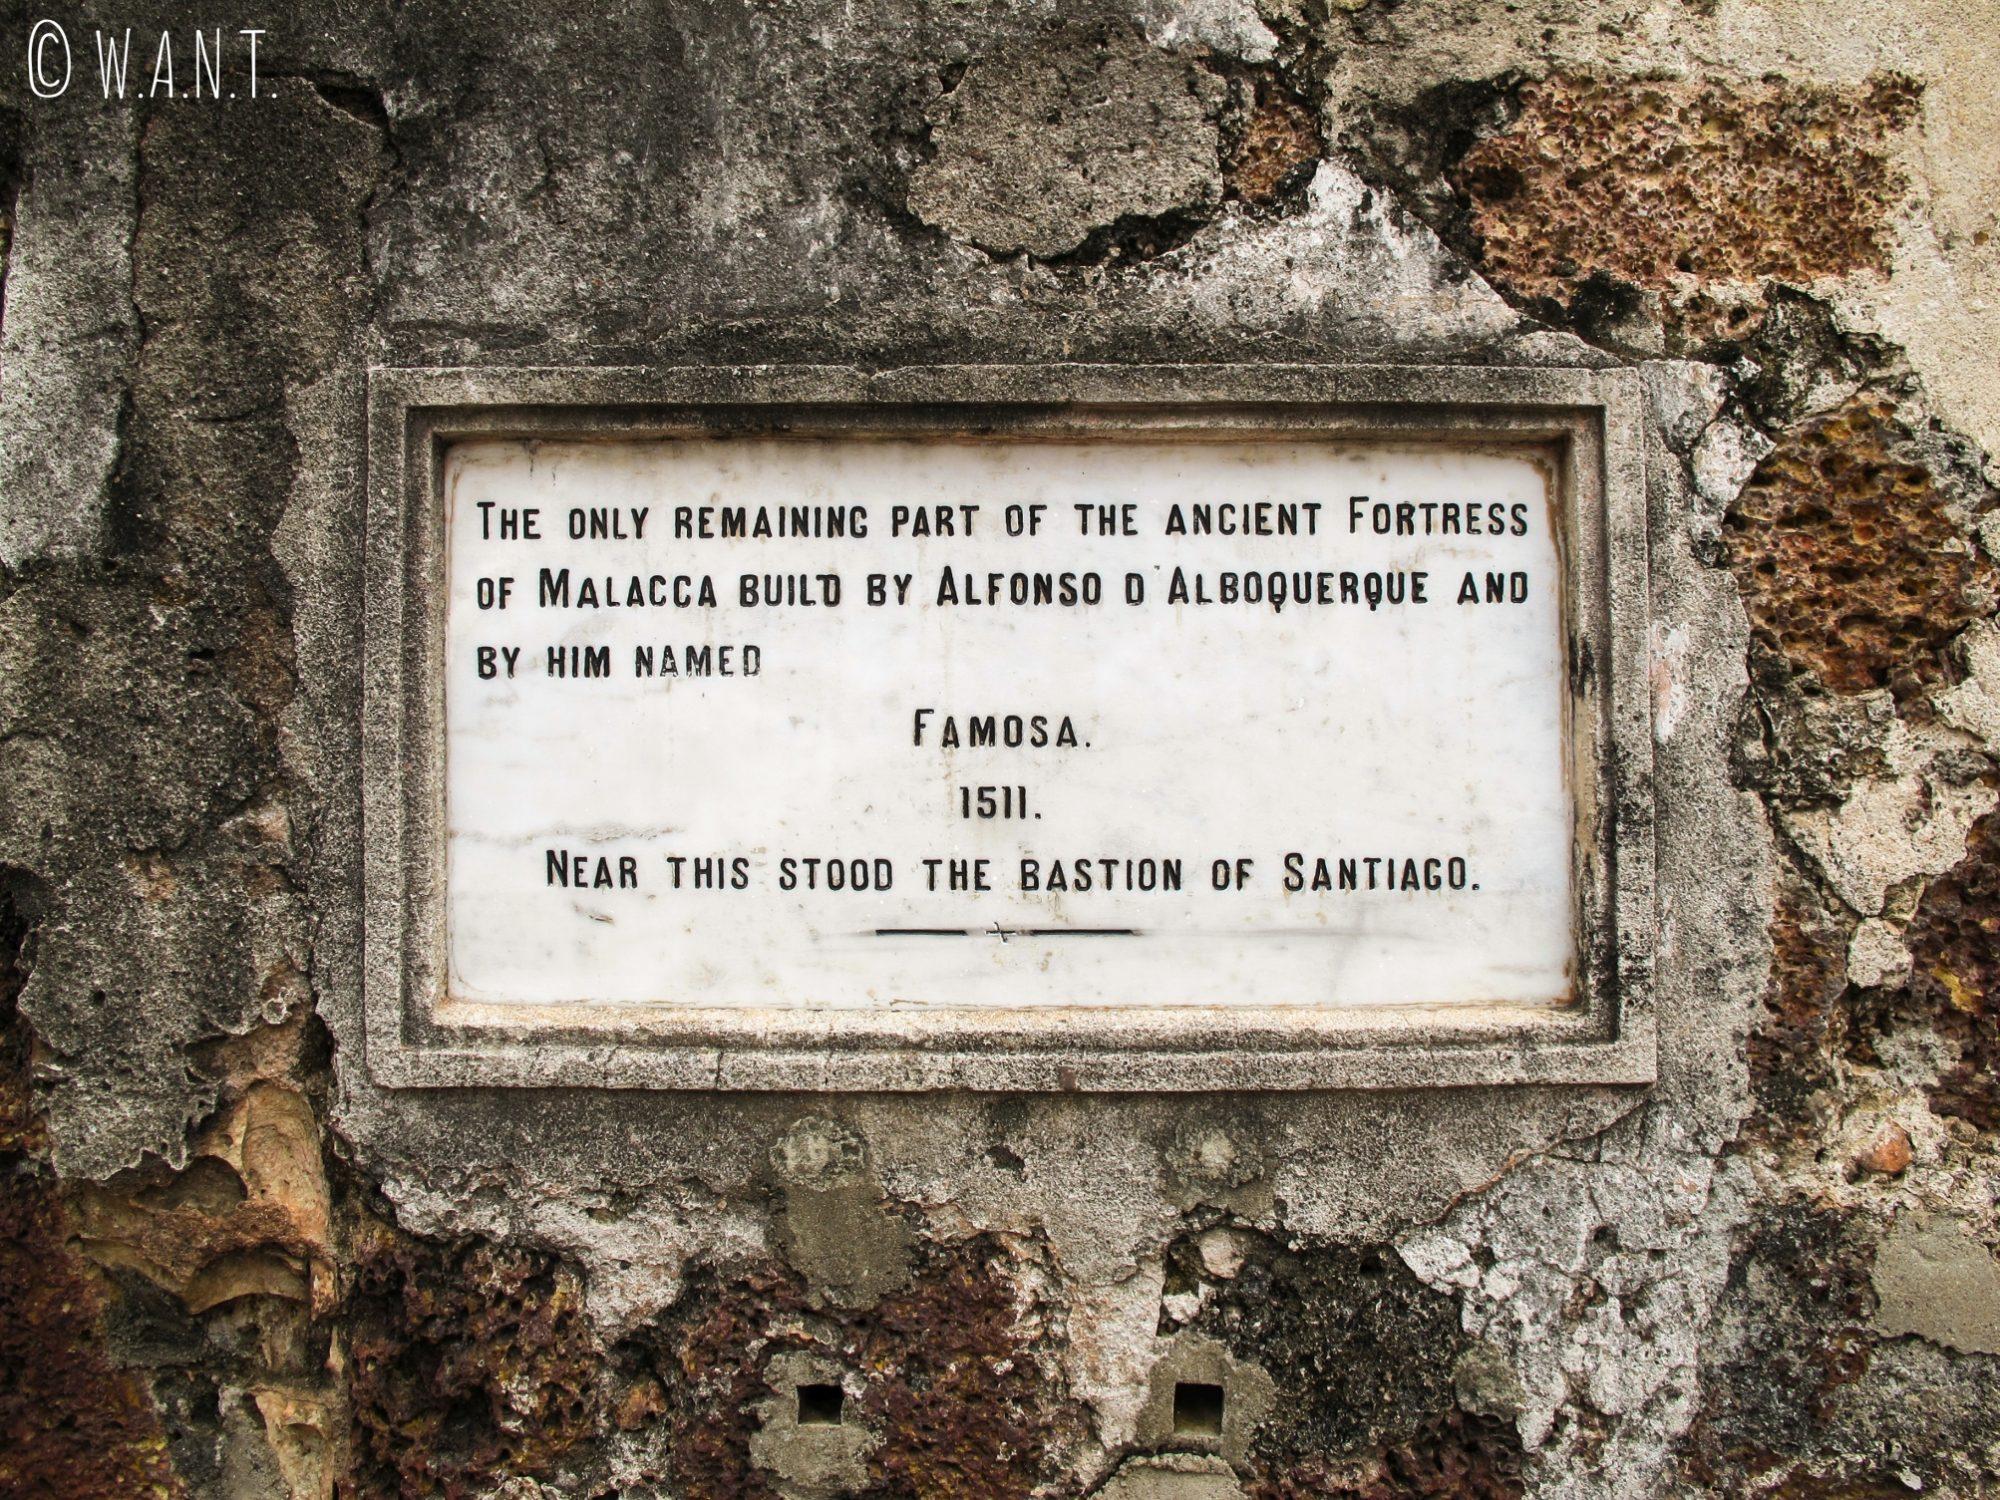 Il ne reste que la Porta de Santiago de la forteresse A'Famosa de Malacca